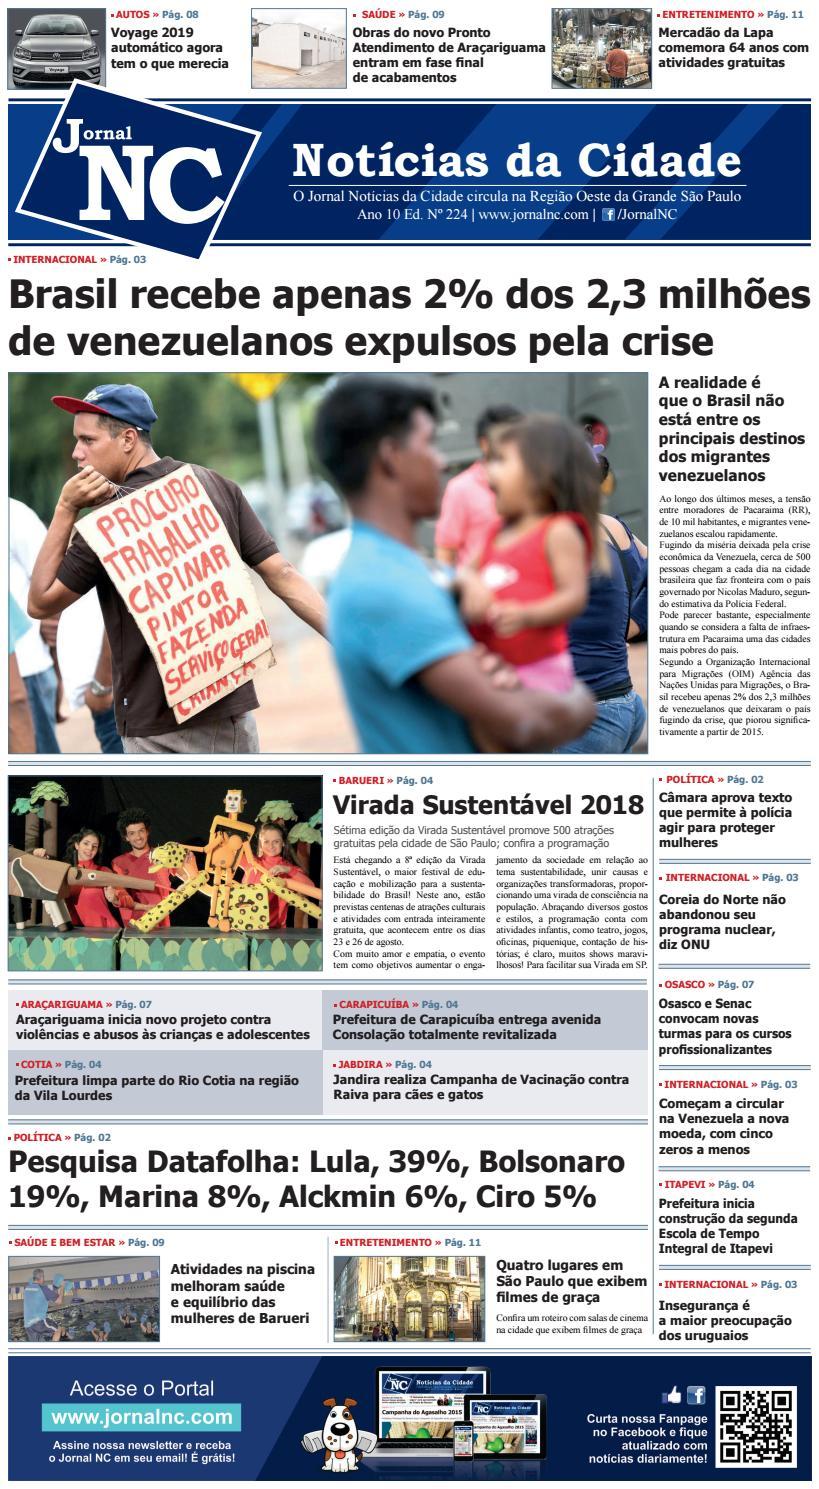 7111d19042 Jornal NC - Notícias da Cidade - Ed. Nº 224 by Jornal NC - issuu